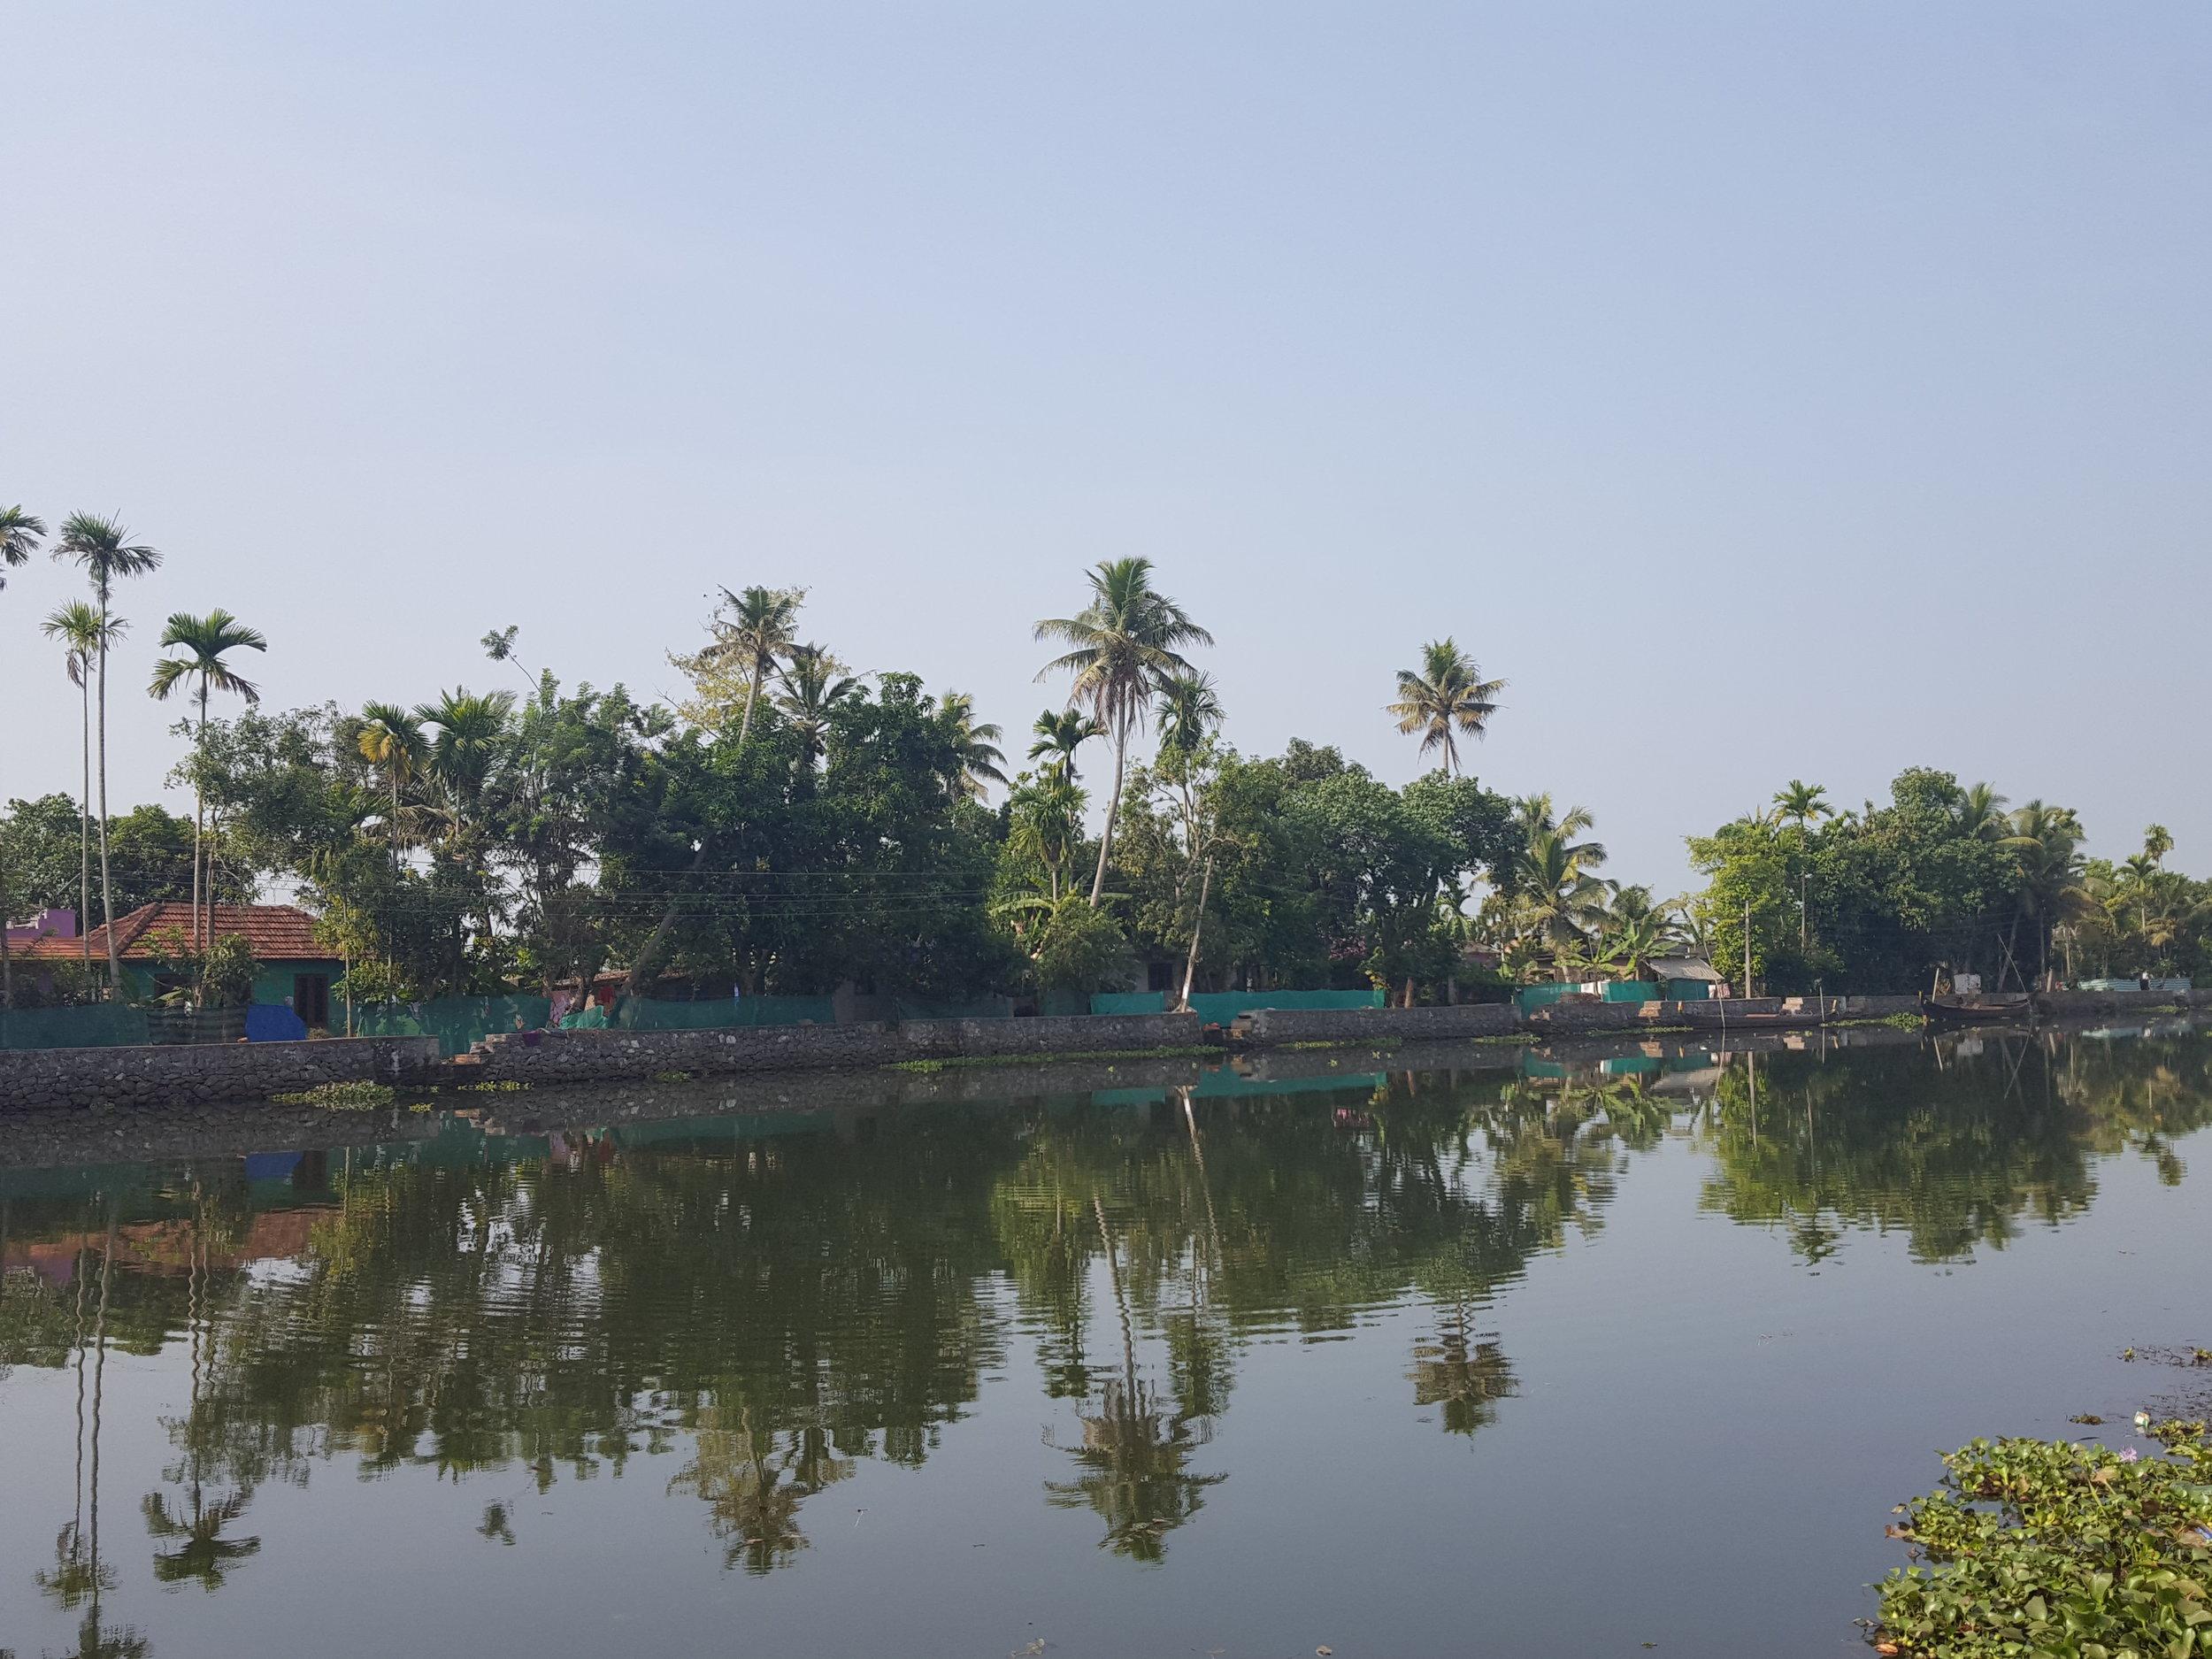 Photograph by Mary Ann Thomas Description: The final plane ride took me to Kerala, India.